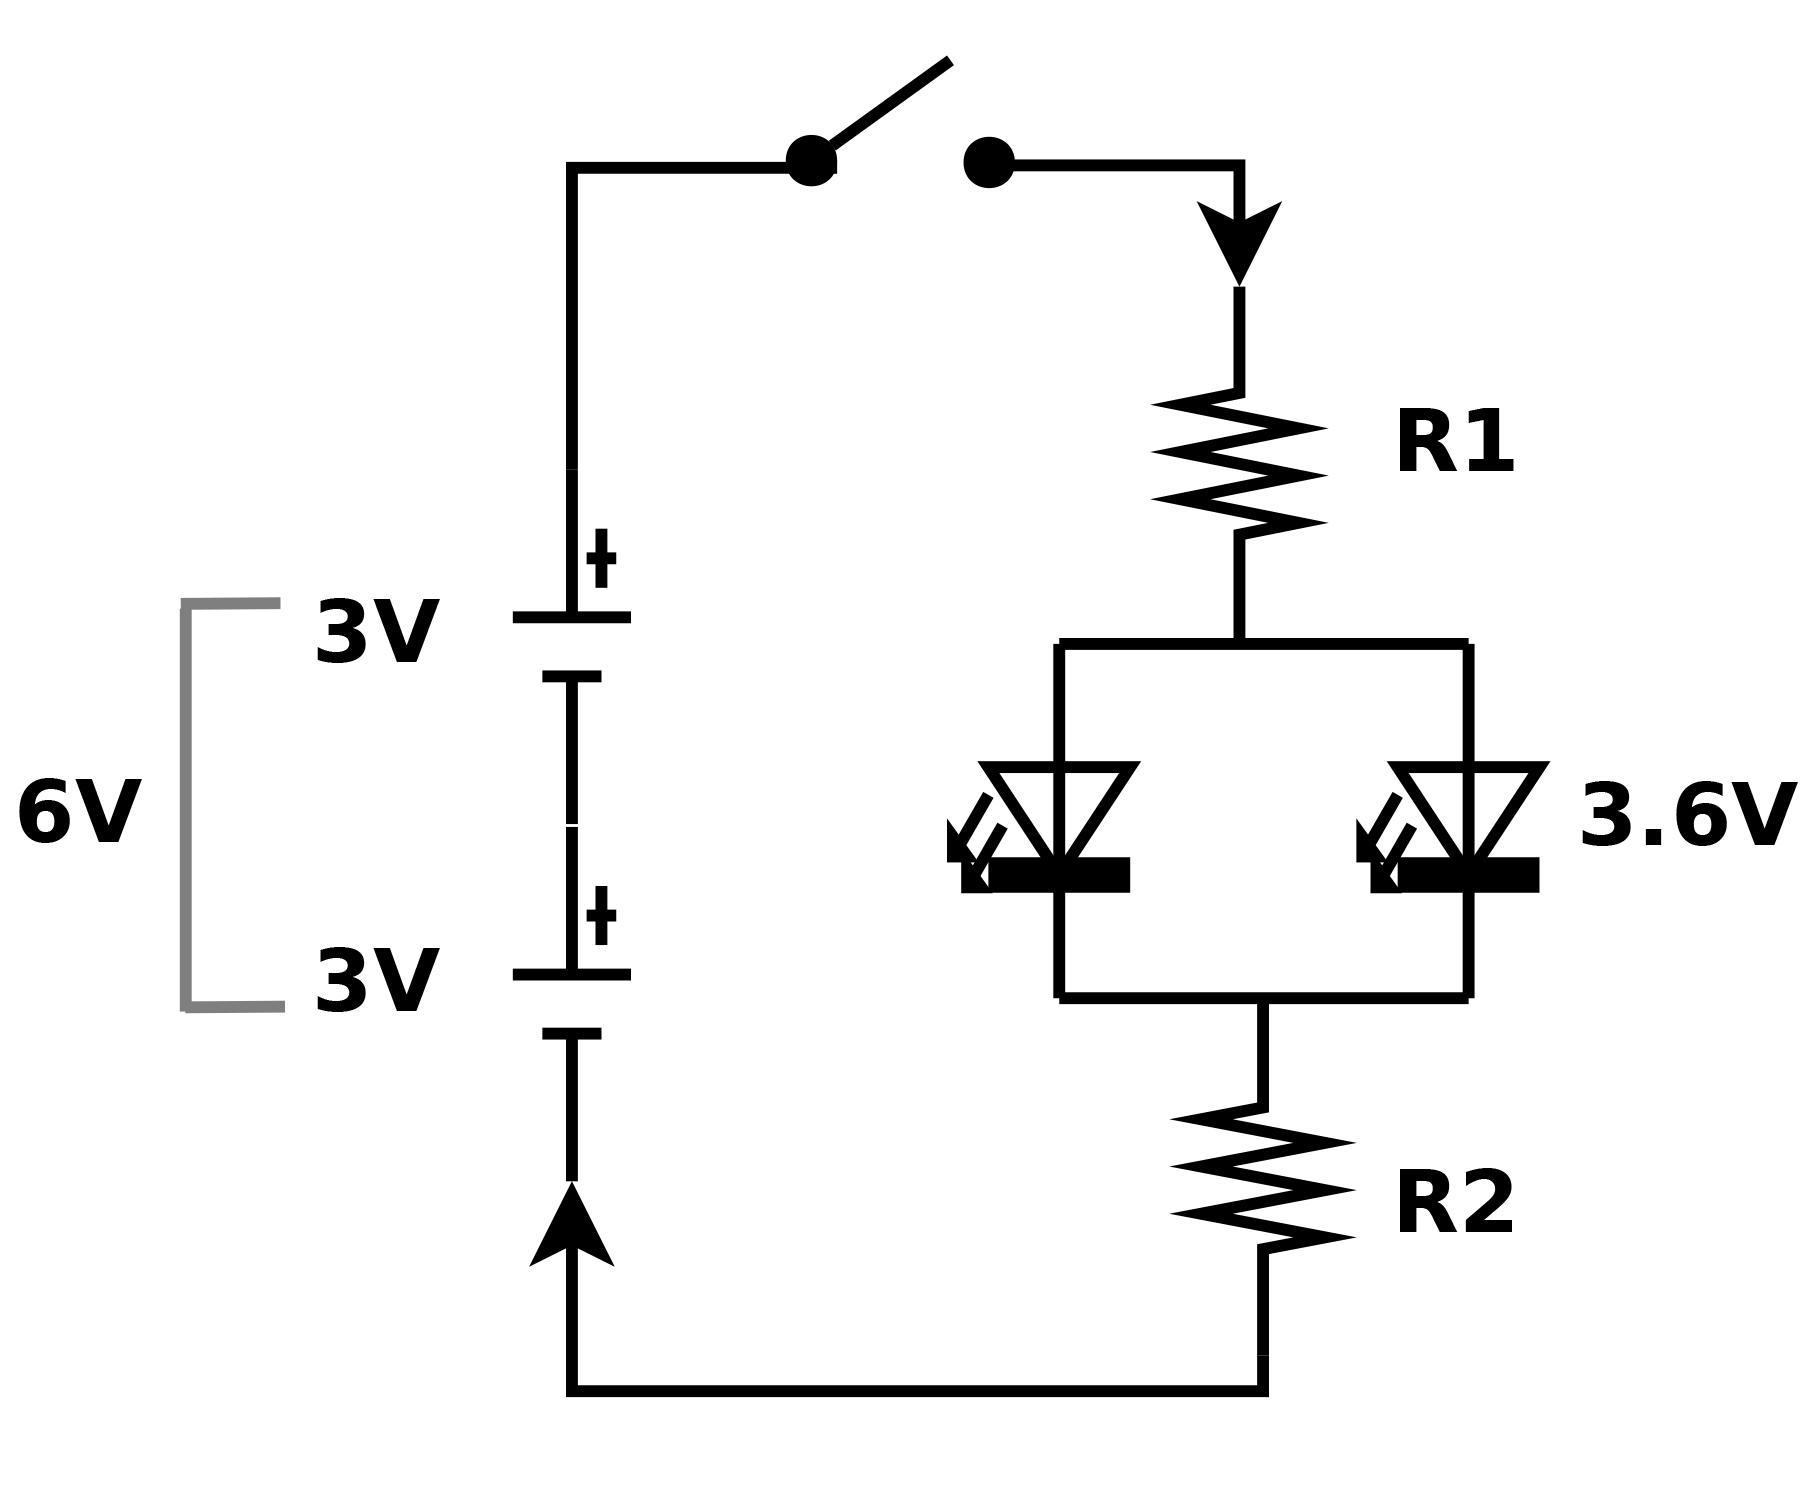 hight resolution of kb jpeg led lamp electronic circuits and diagram electronics modulation electronic circuits and diagramelectronics projects